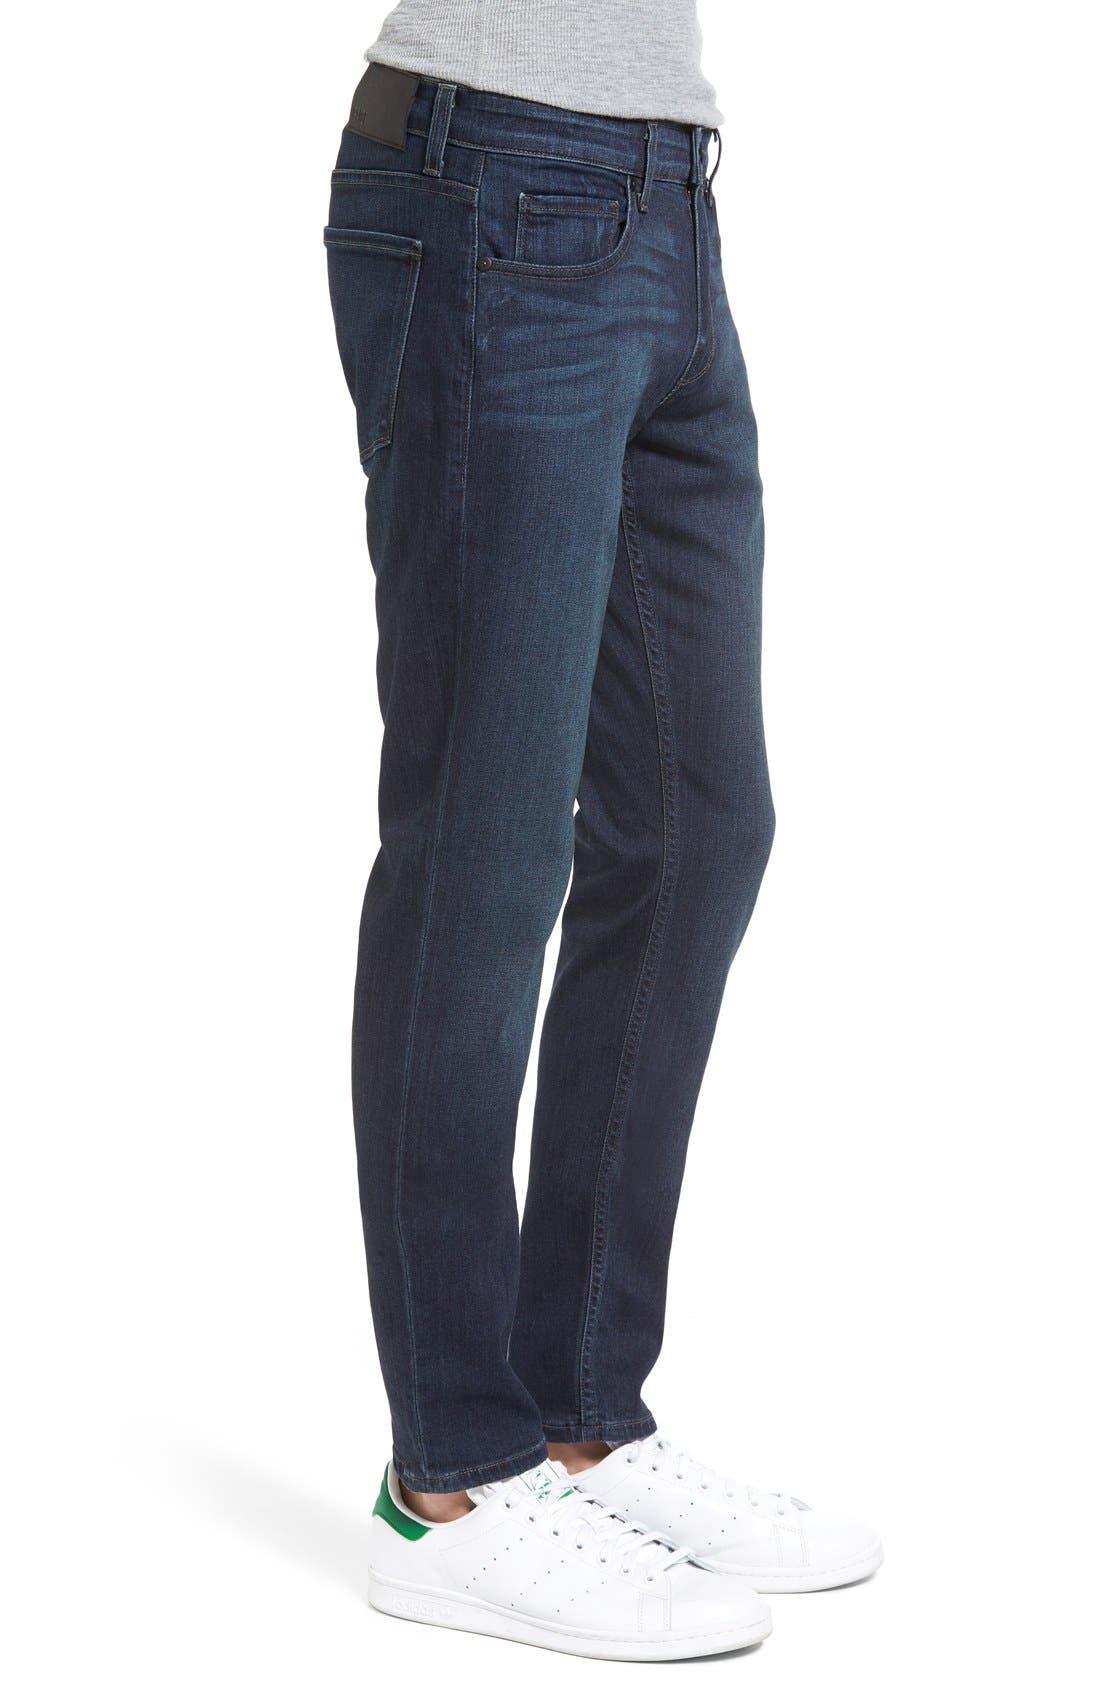 Transcend - Croft Skinny Fit Jeans,                             Alternate thumbnail 3, color,                             After Hours